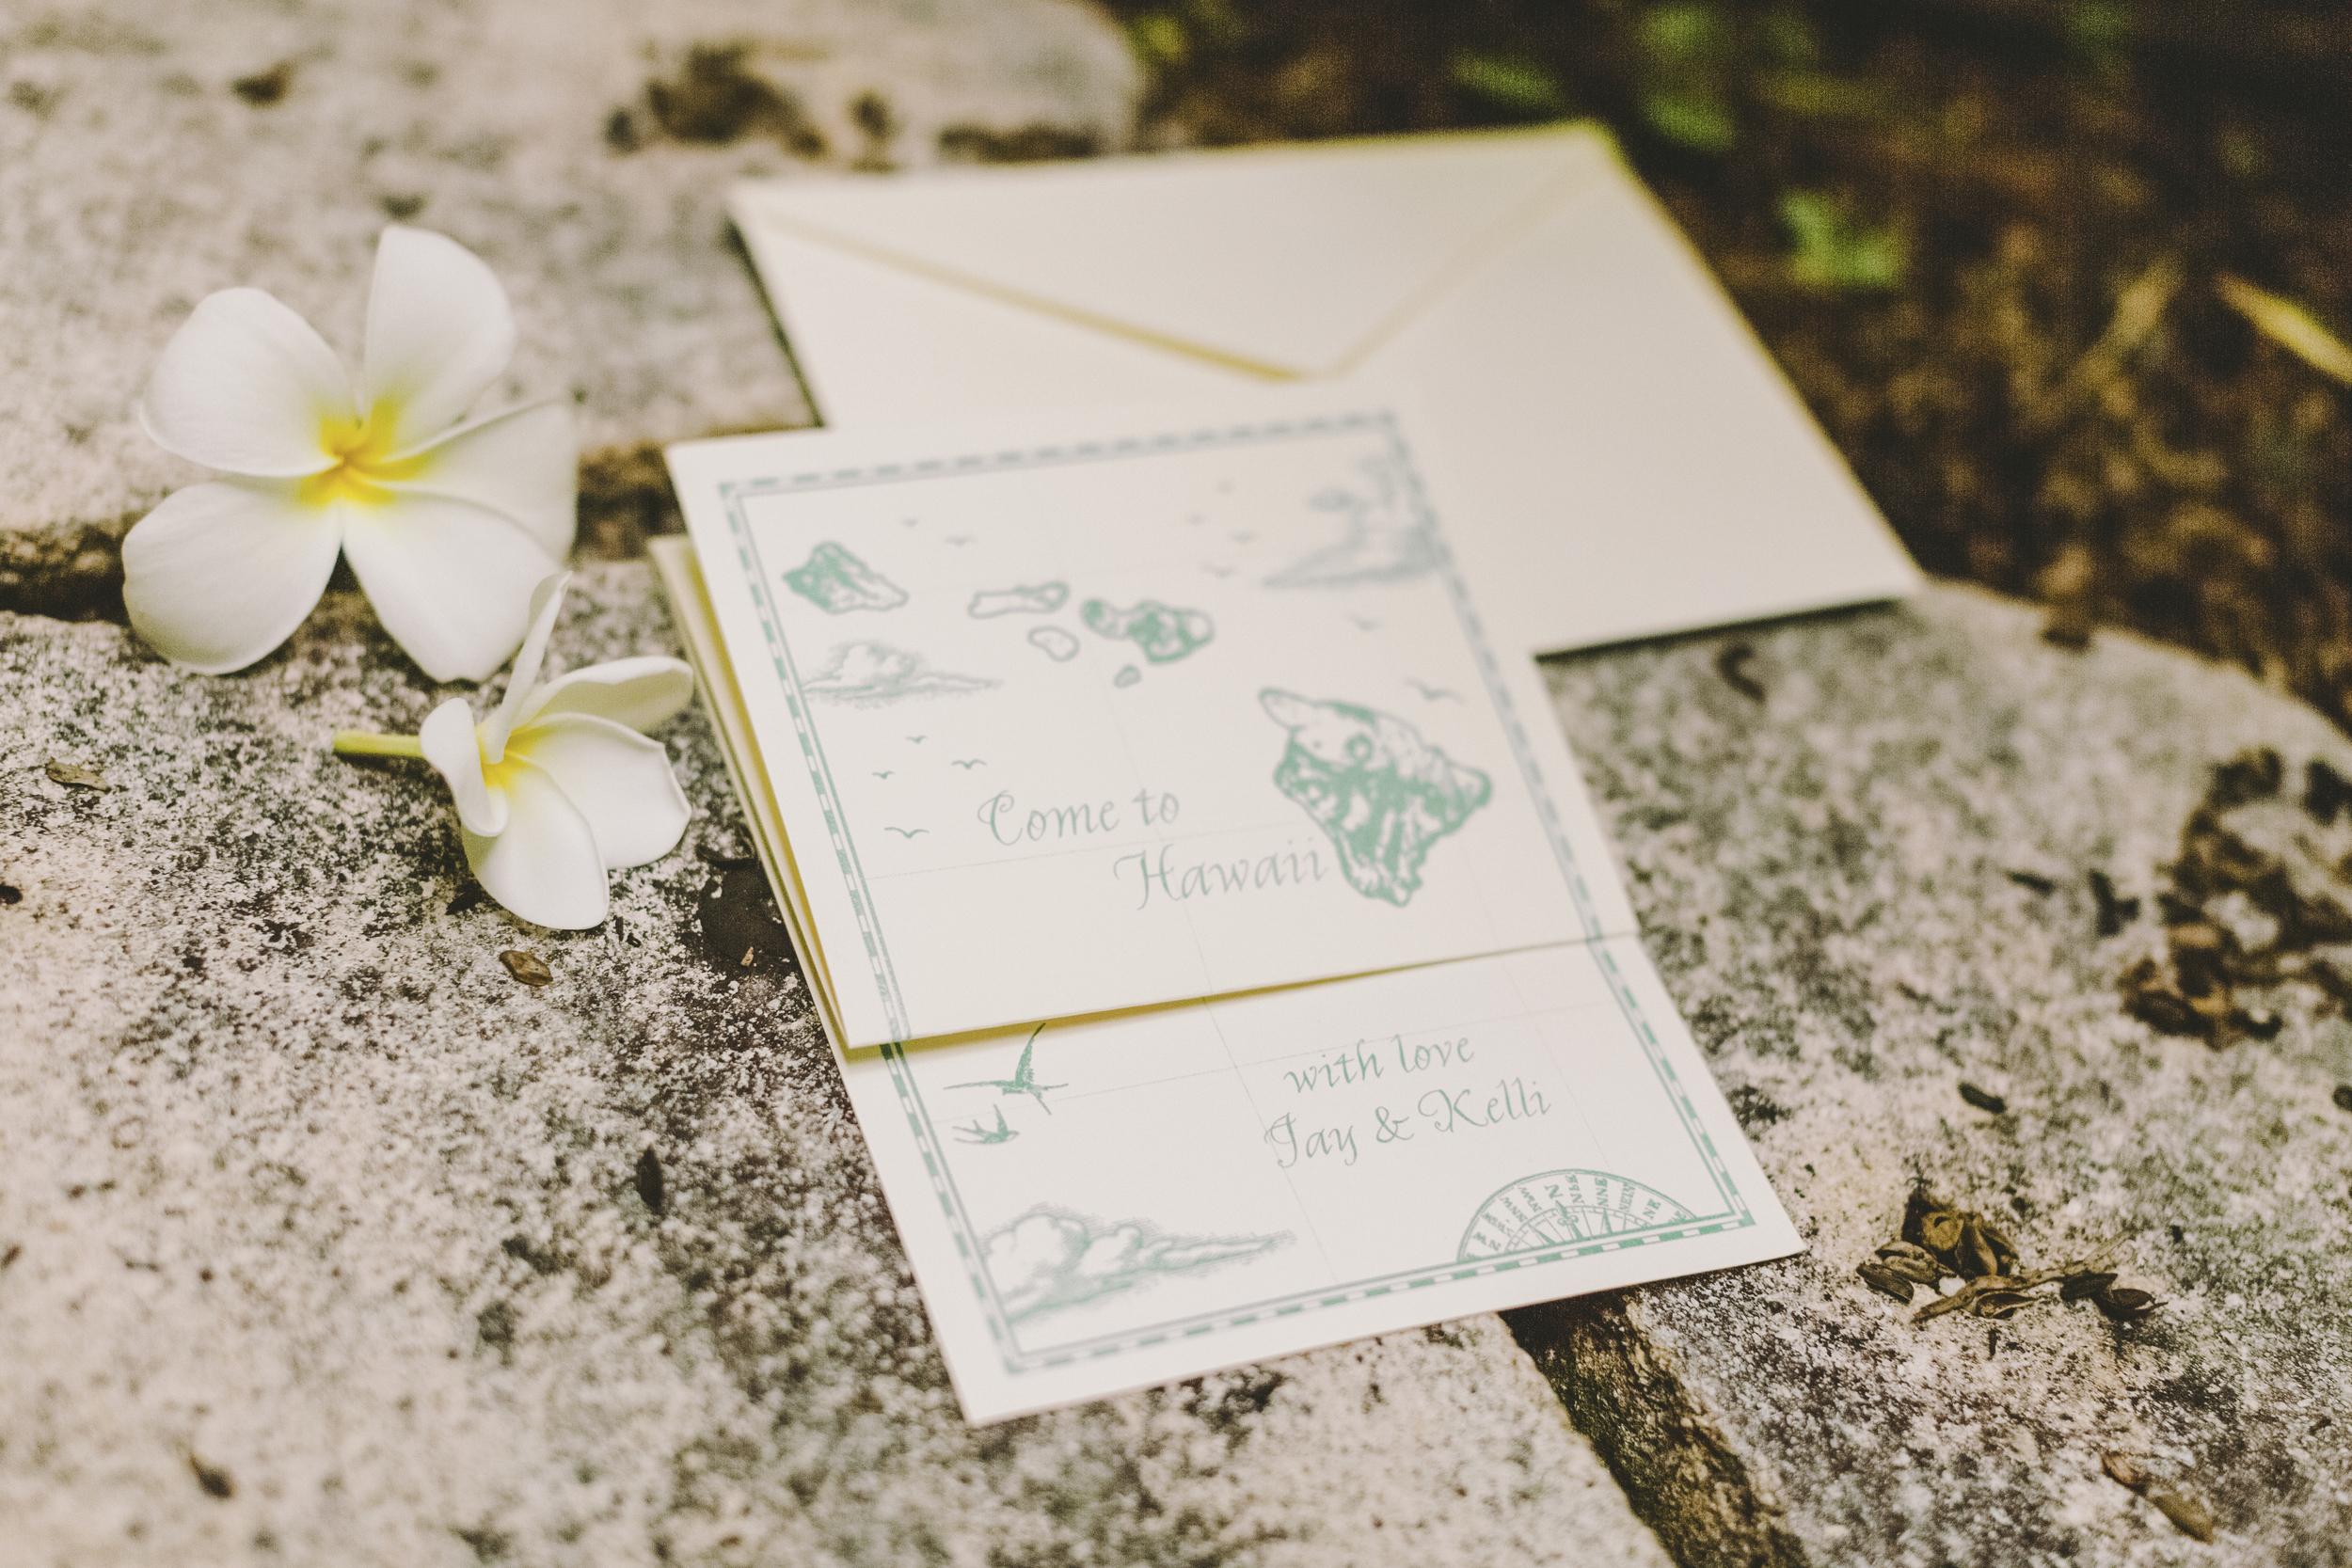 angie-diaz-photography-hawaii-wedding-photographer-kelli-jay-39.jpg